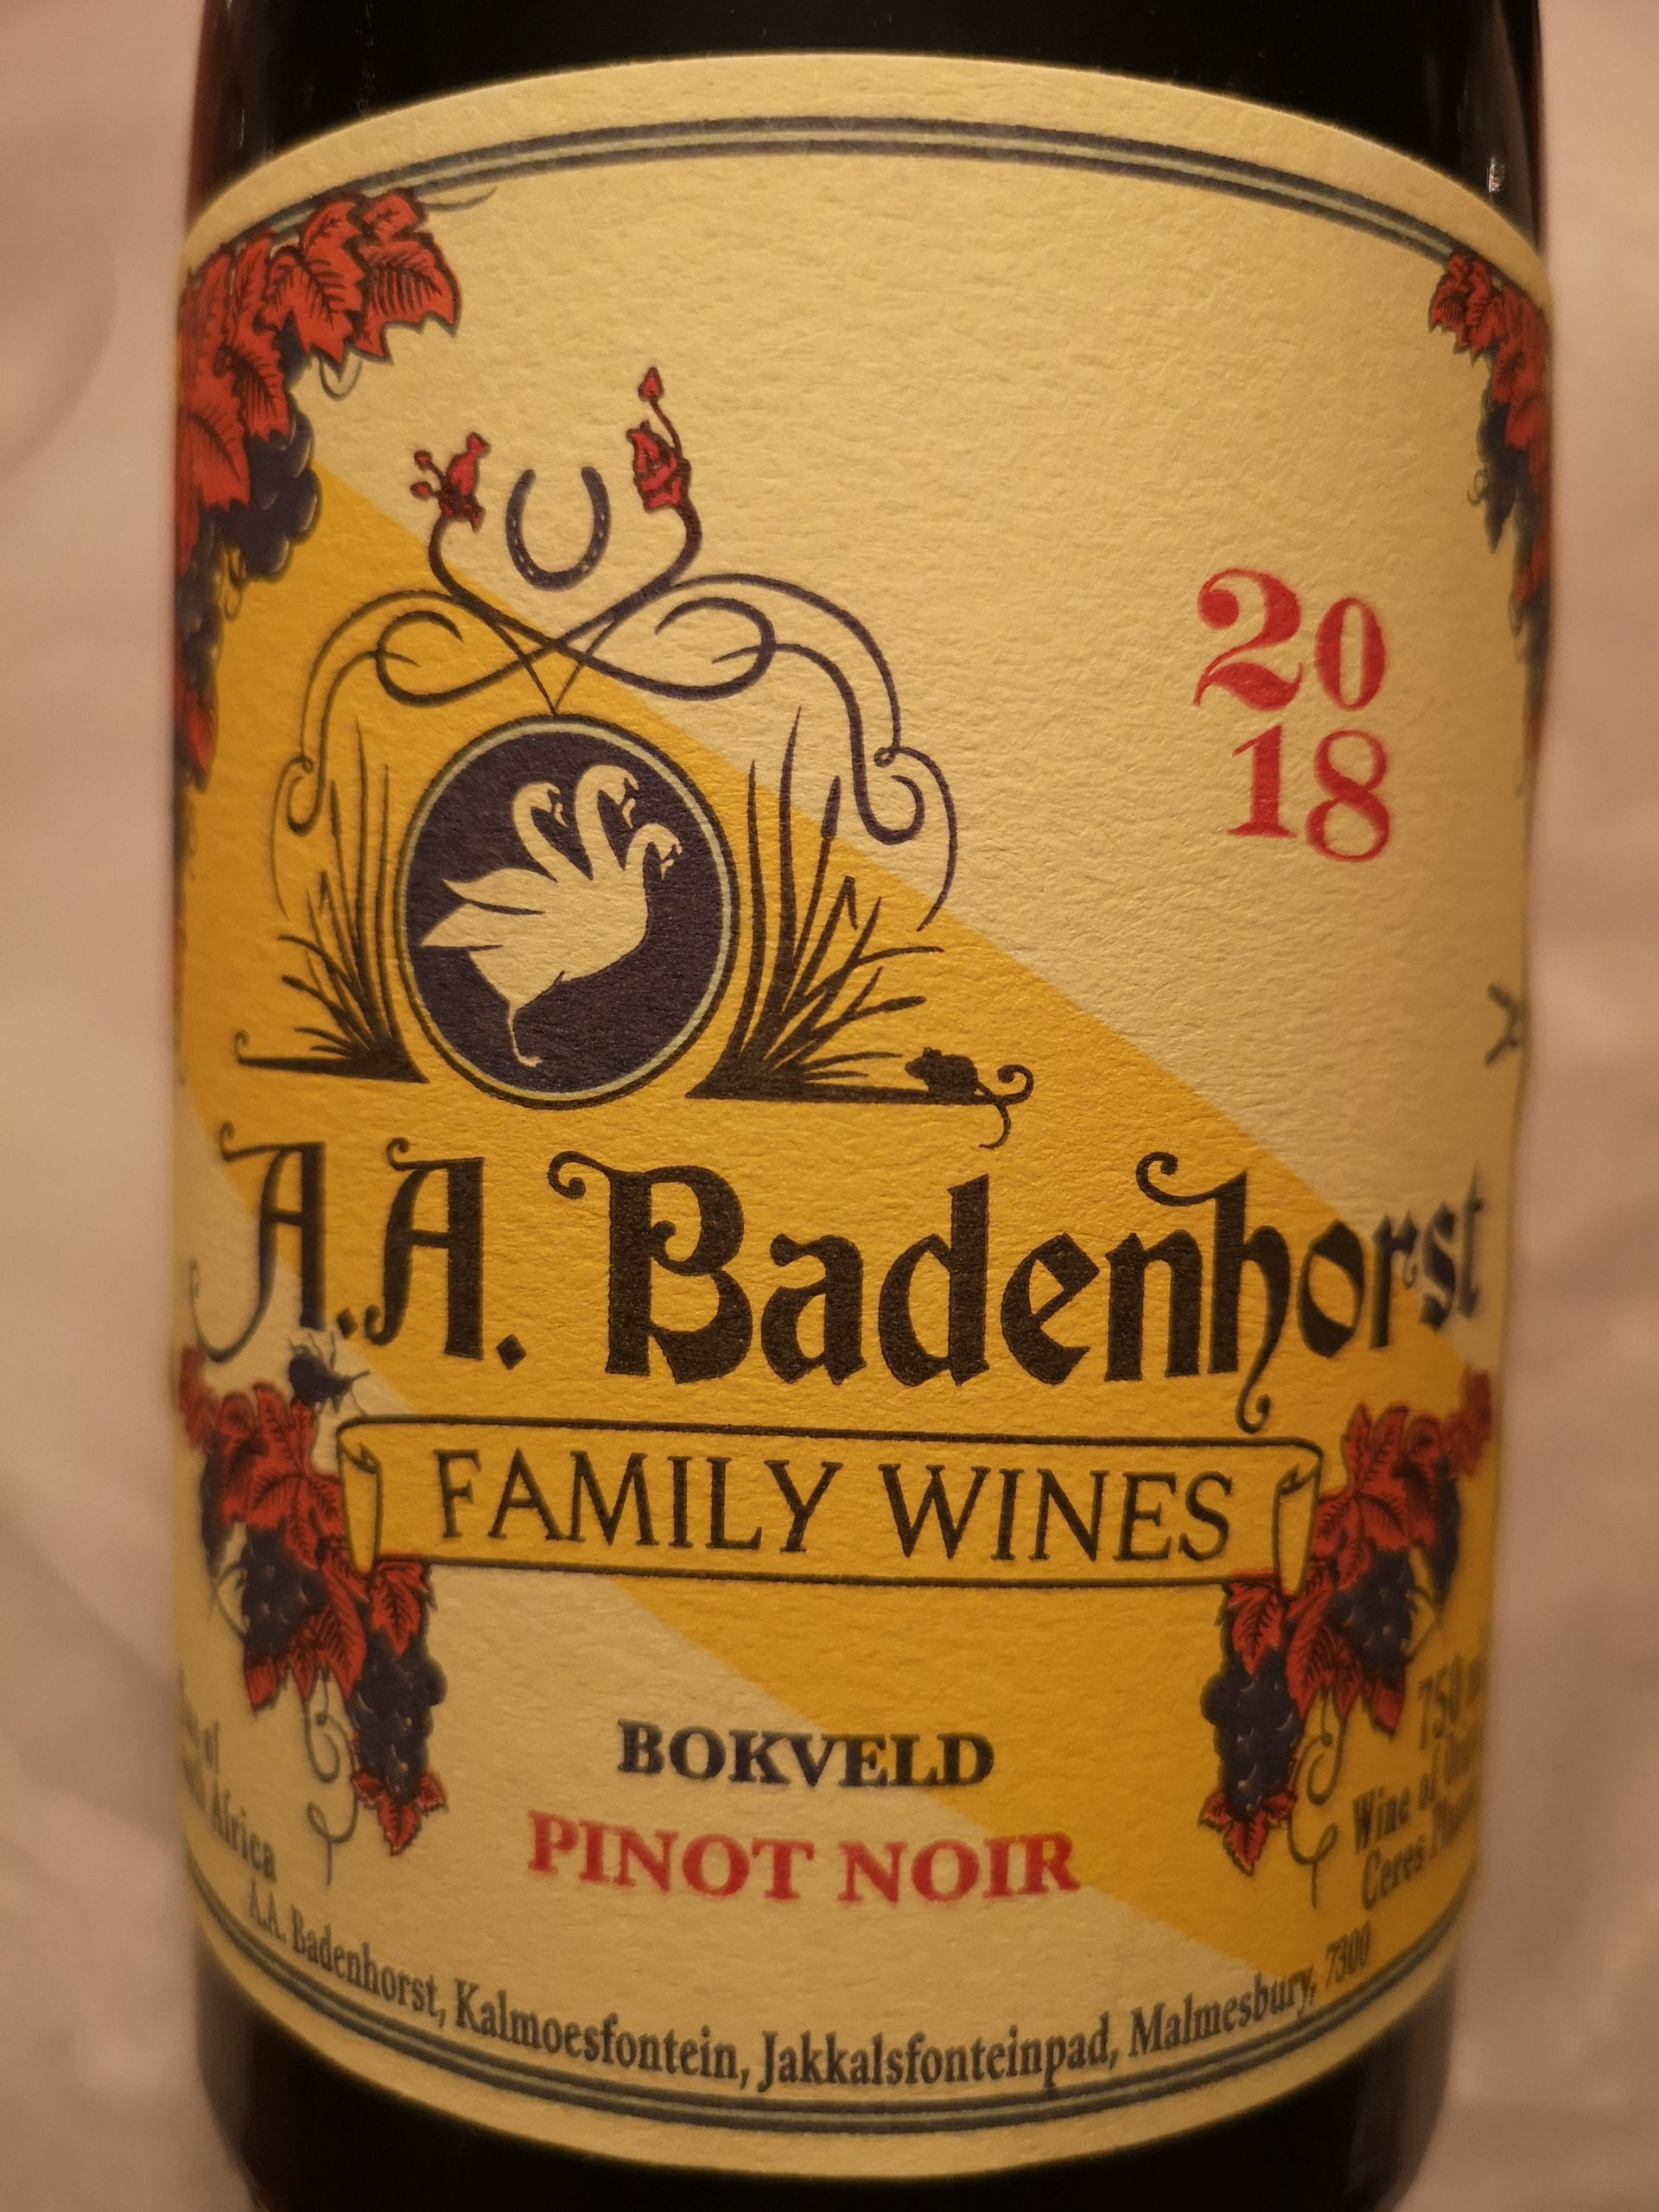 2018 Pinot Noir Bokveld | A.A. Badenhorst